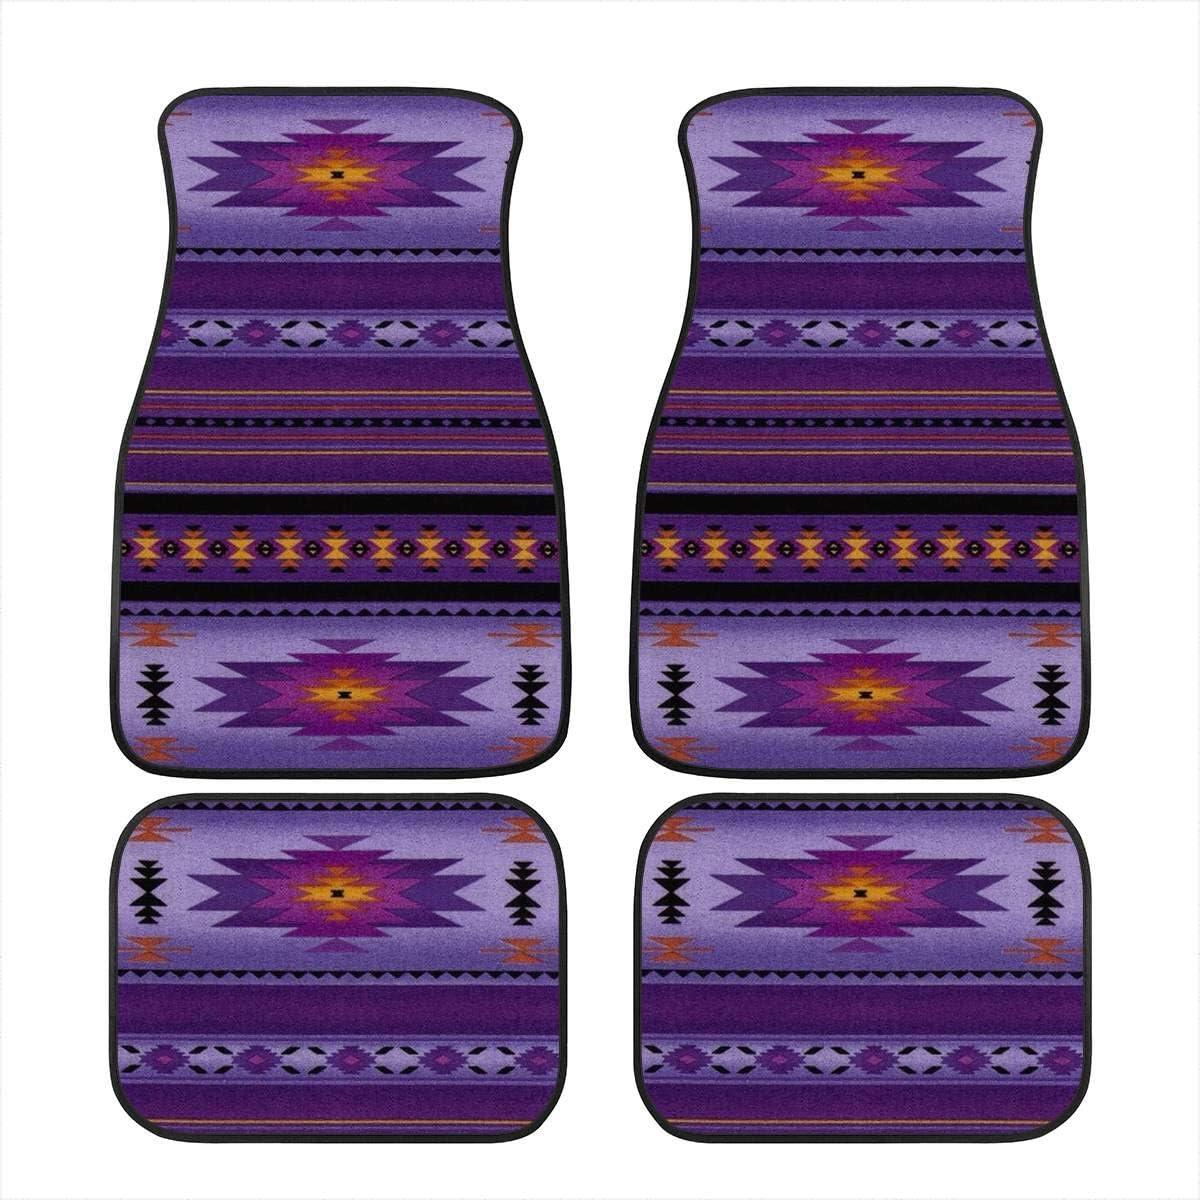 INSTANTARTS 4 Piece Aztec Ethnic Design Auto Front /& Rear Floor Mats,Universal Fit Anti Skid Washable Car Floor Carpets for SUV Trucks Red